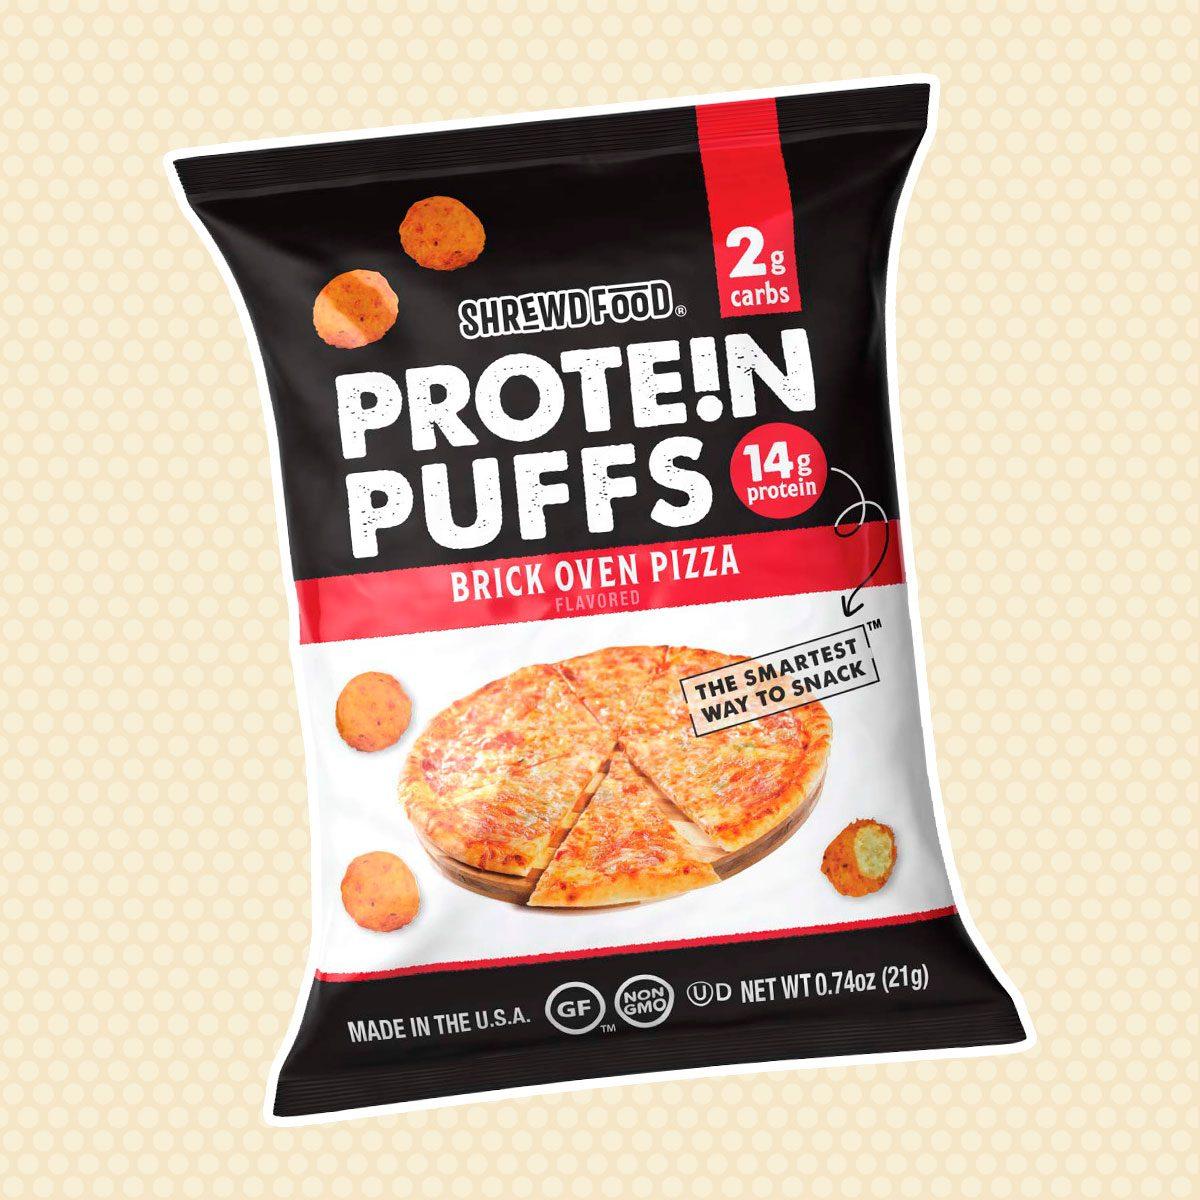 Shrewd Food Brick Oven Pizza Protein Crisps